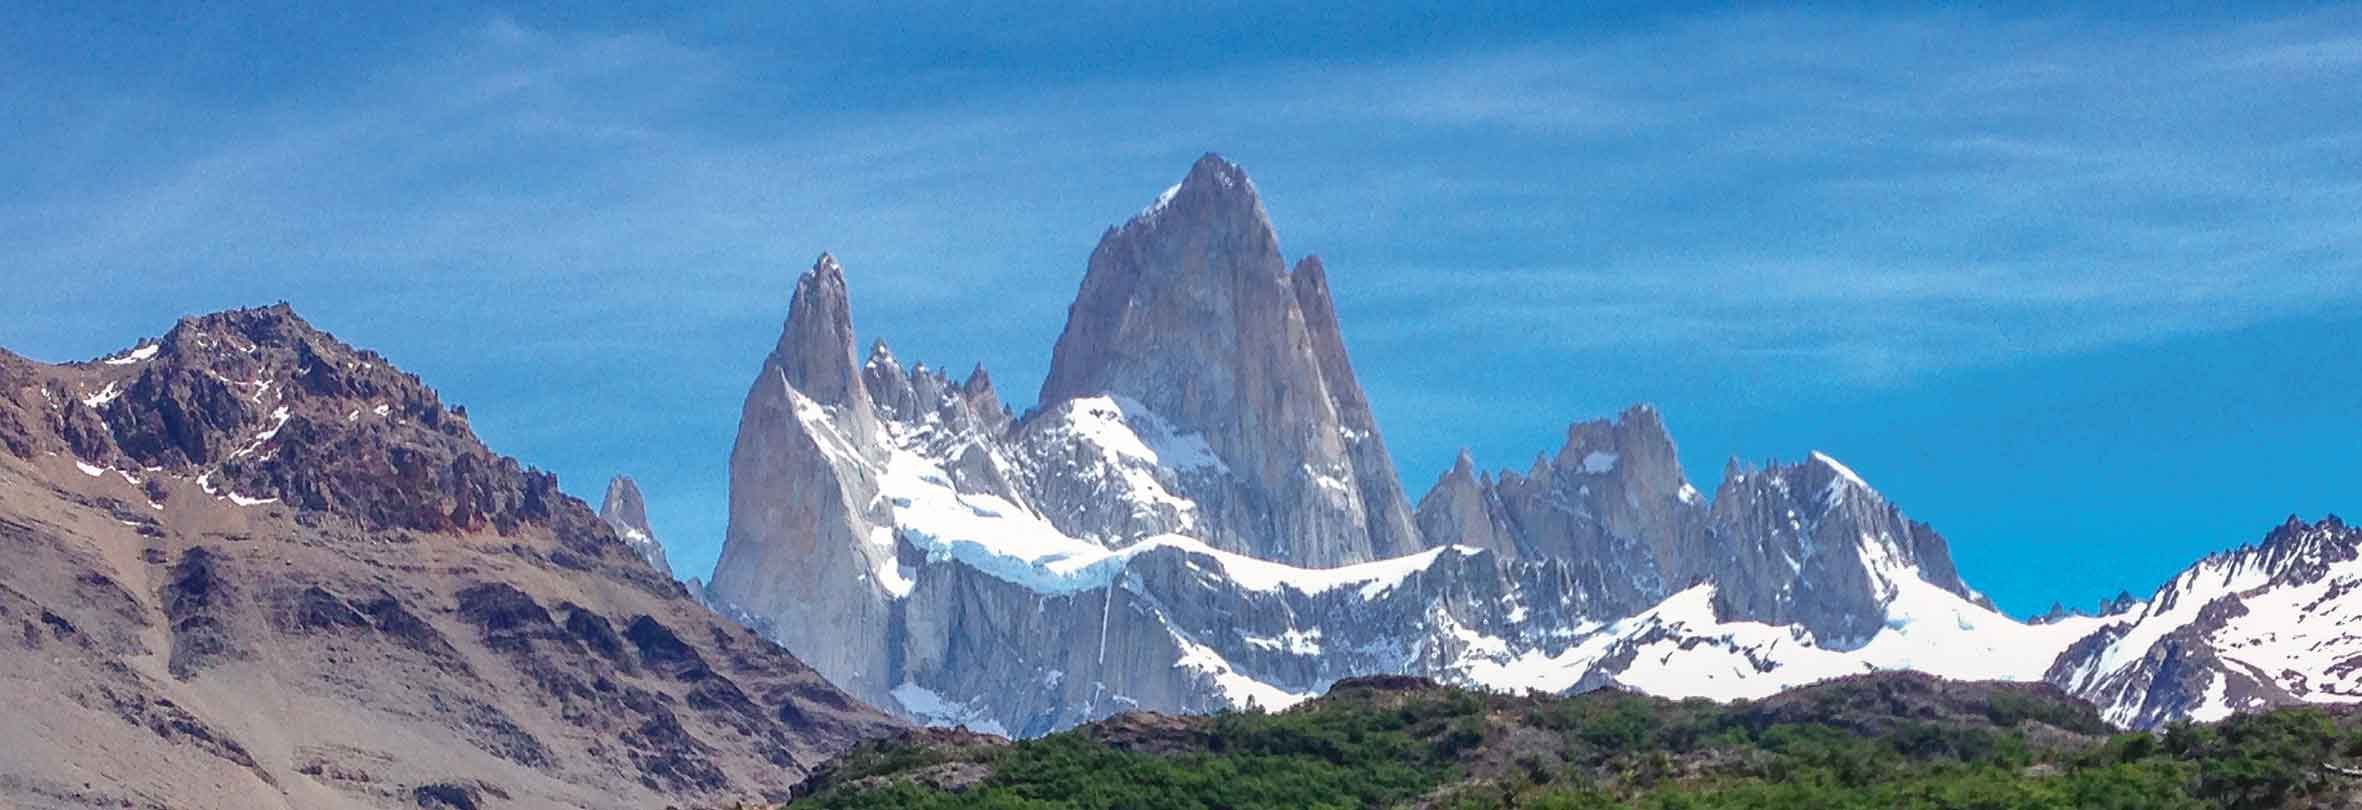 Fitz Roy, El Chaltén, Patagonien